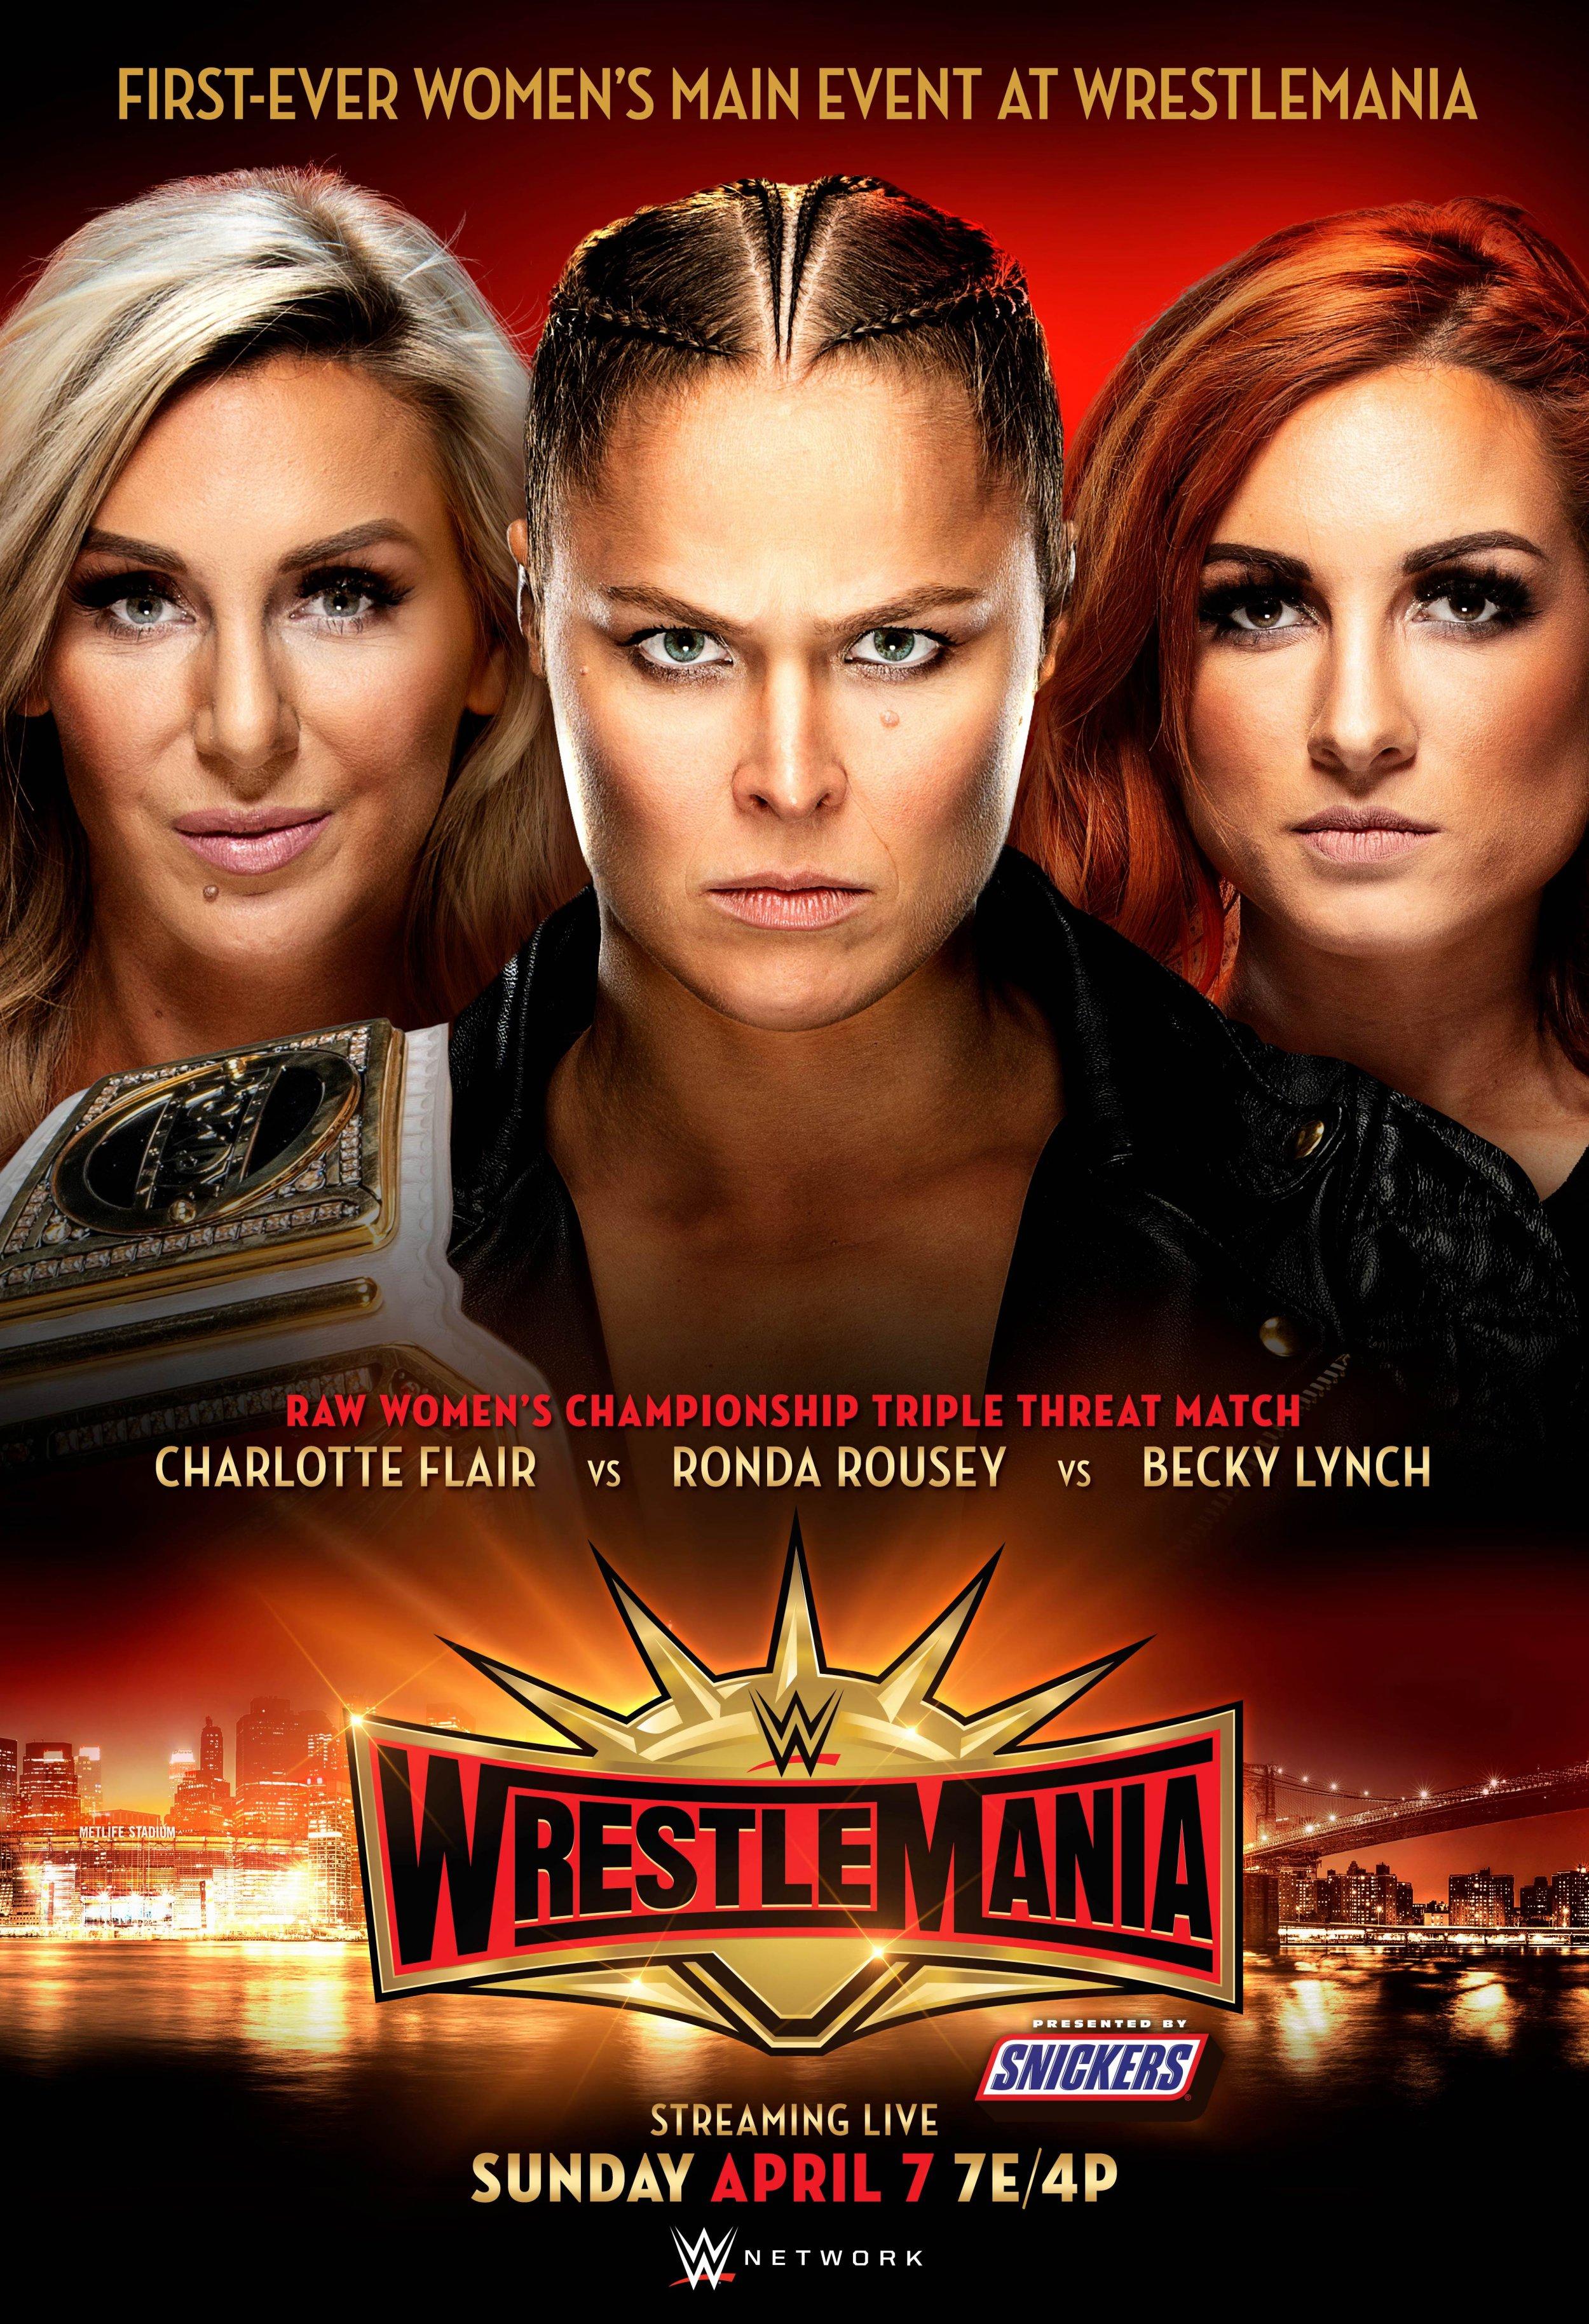 wwe wrestlemania 35 poster main event triple threat